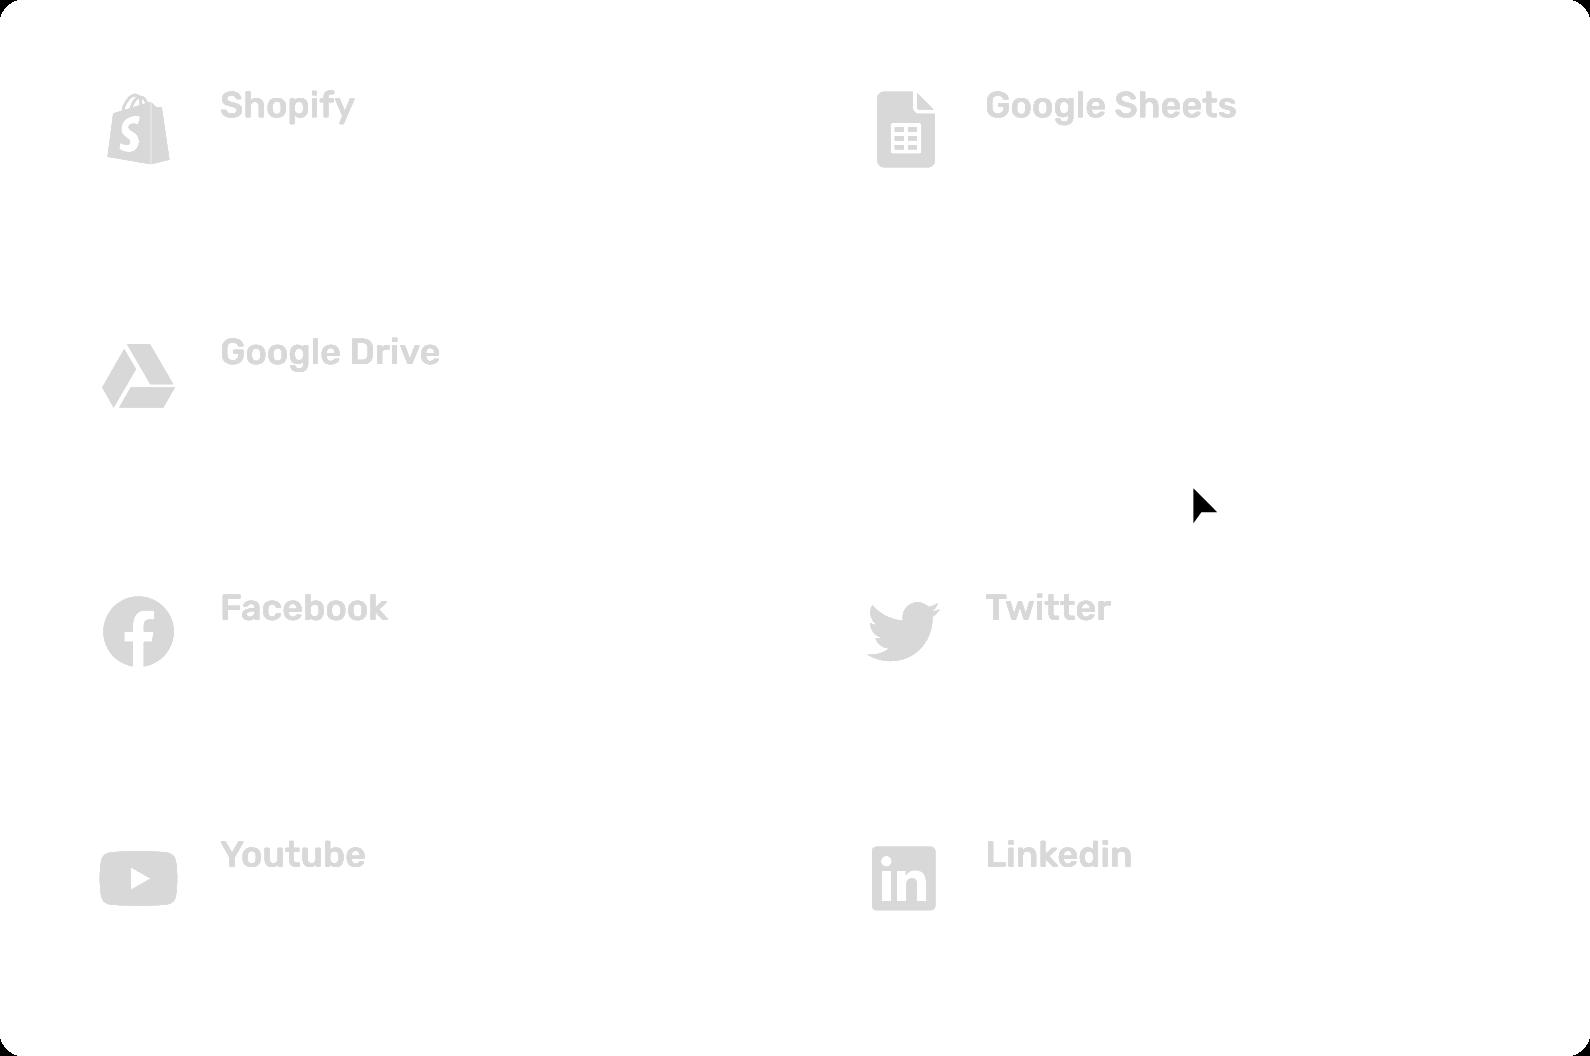 simplified-image-6